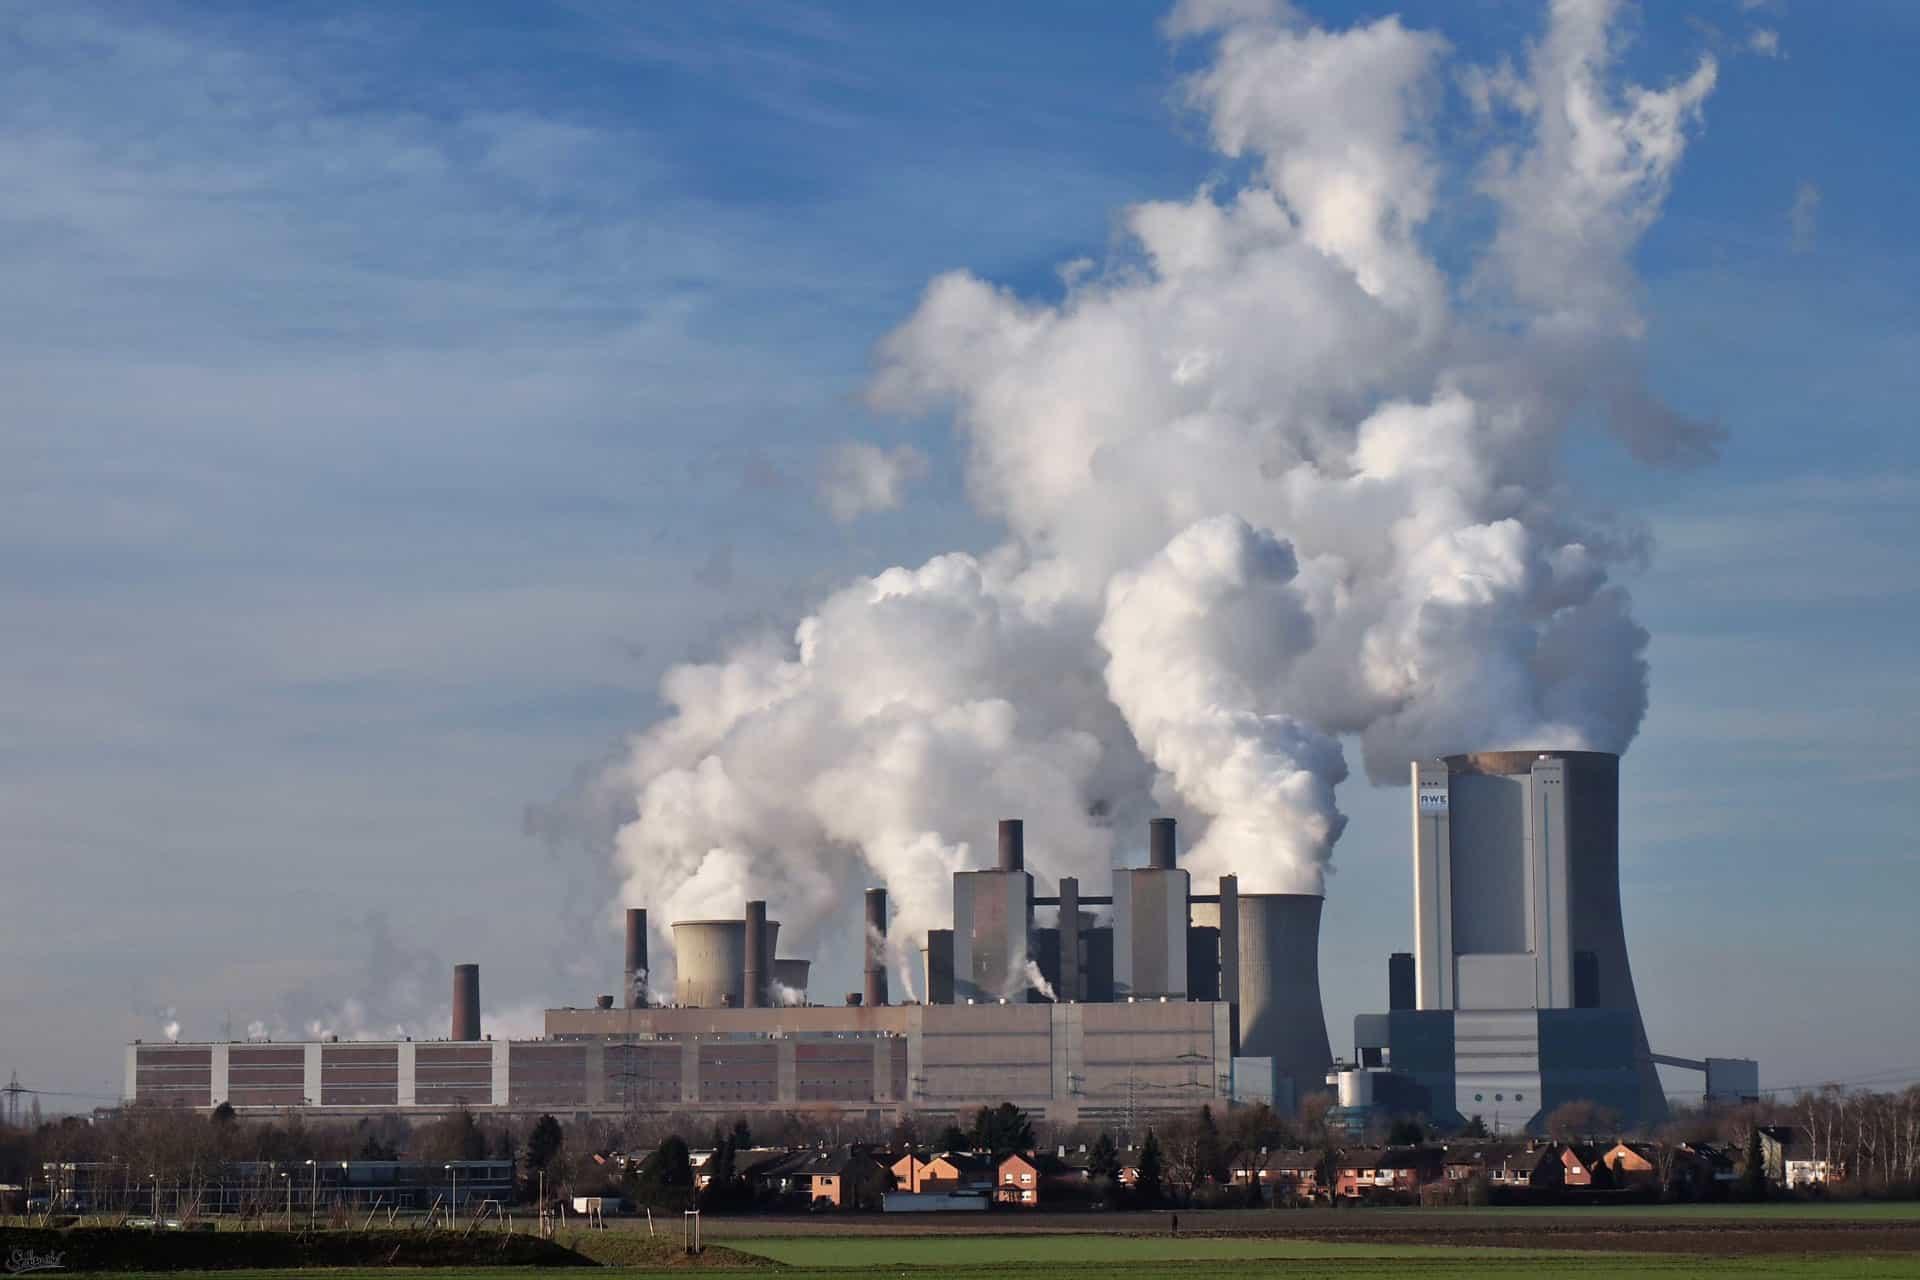 Das Kohle Kraftwerk Niederaußem